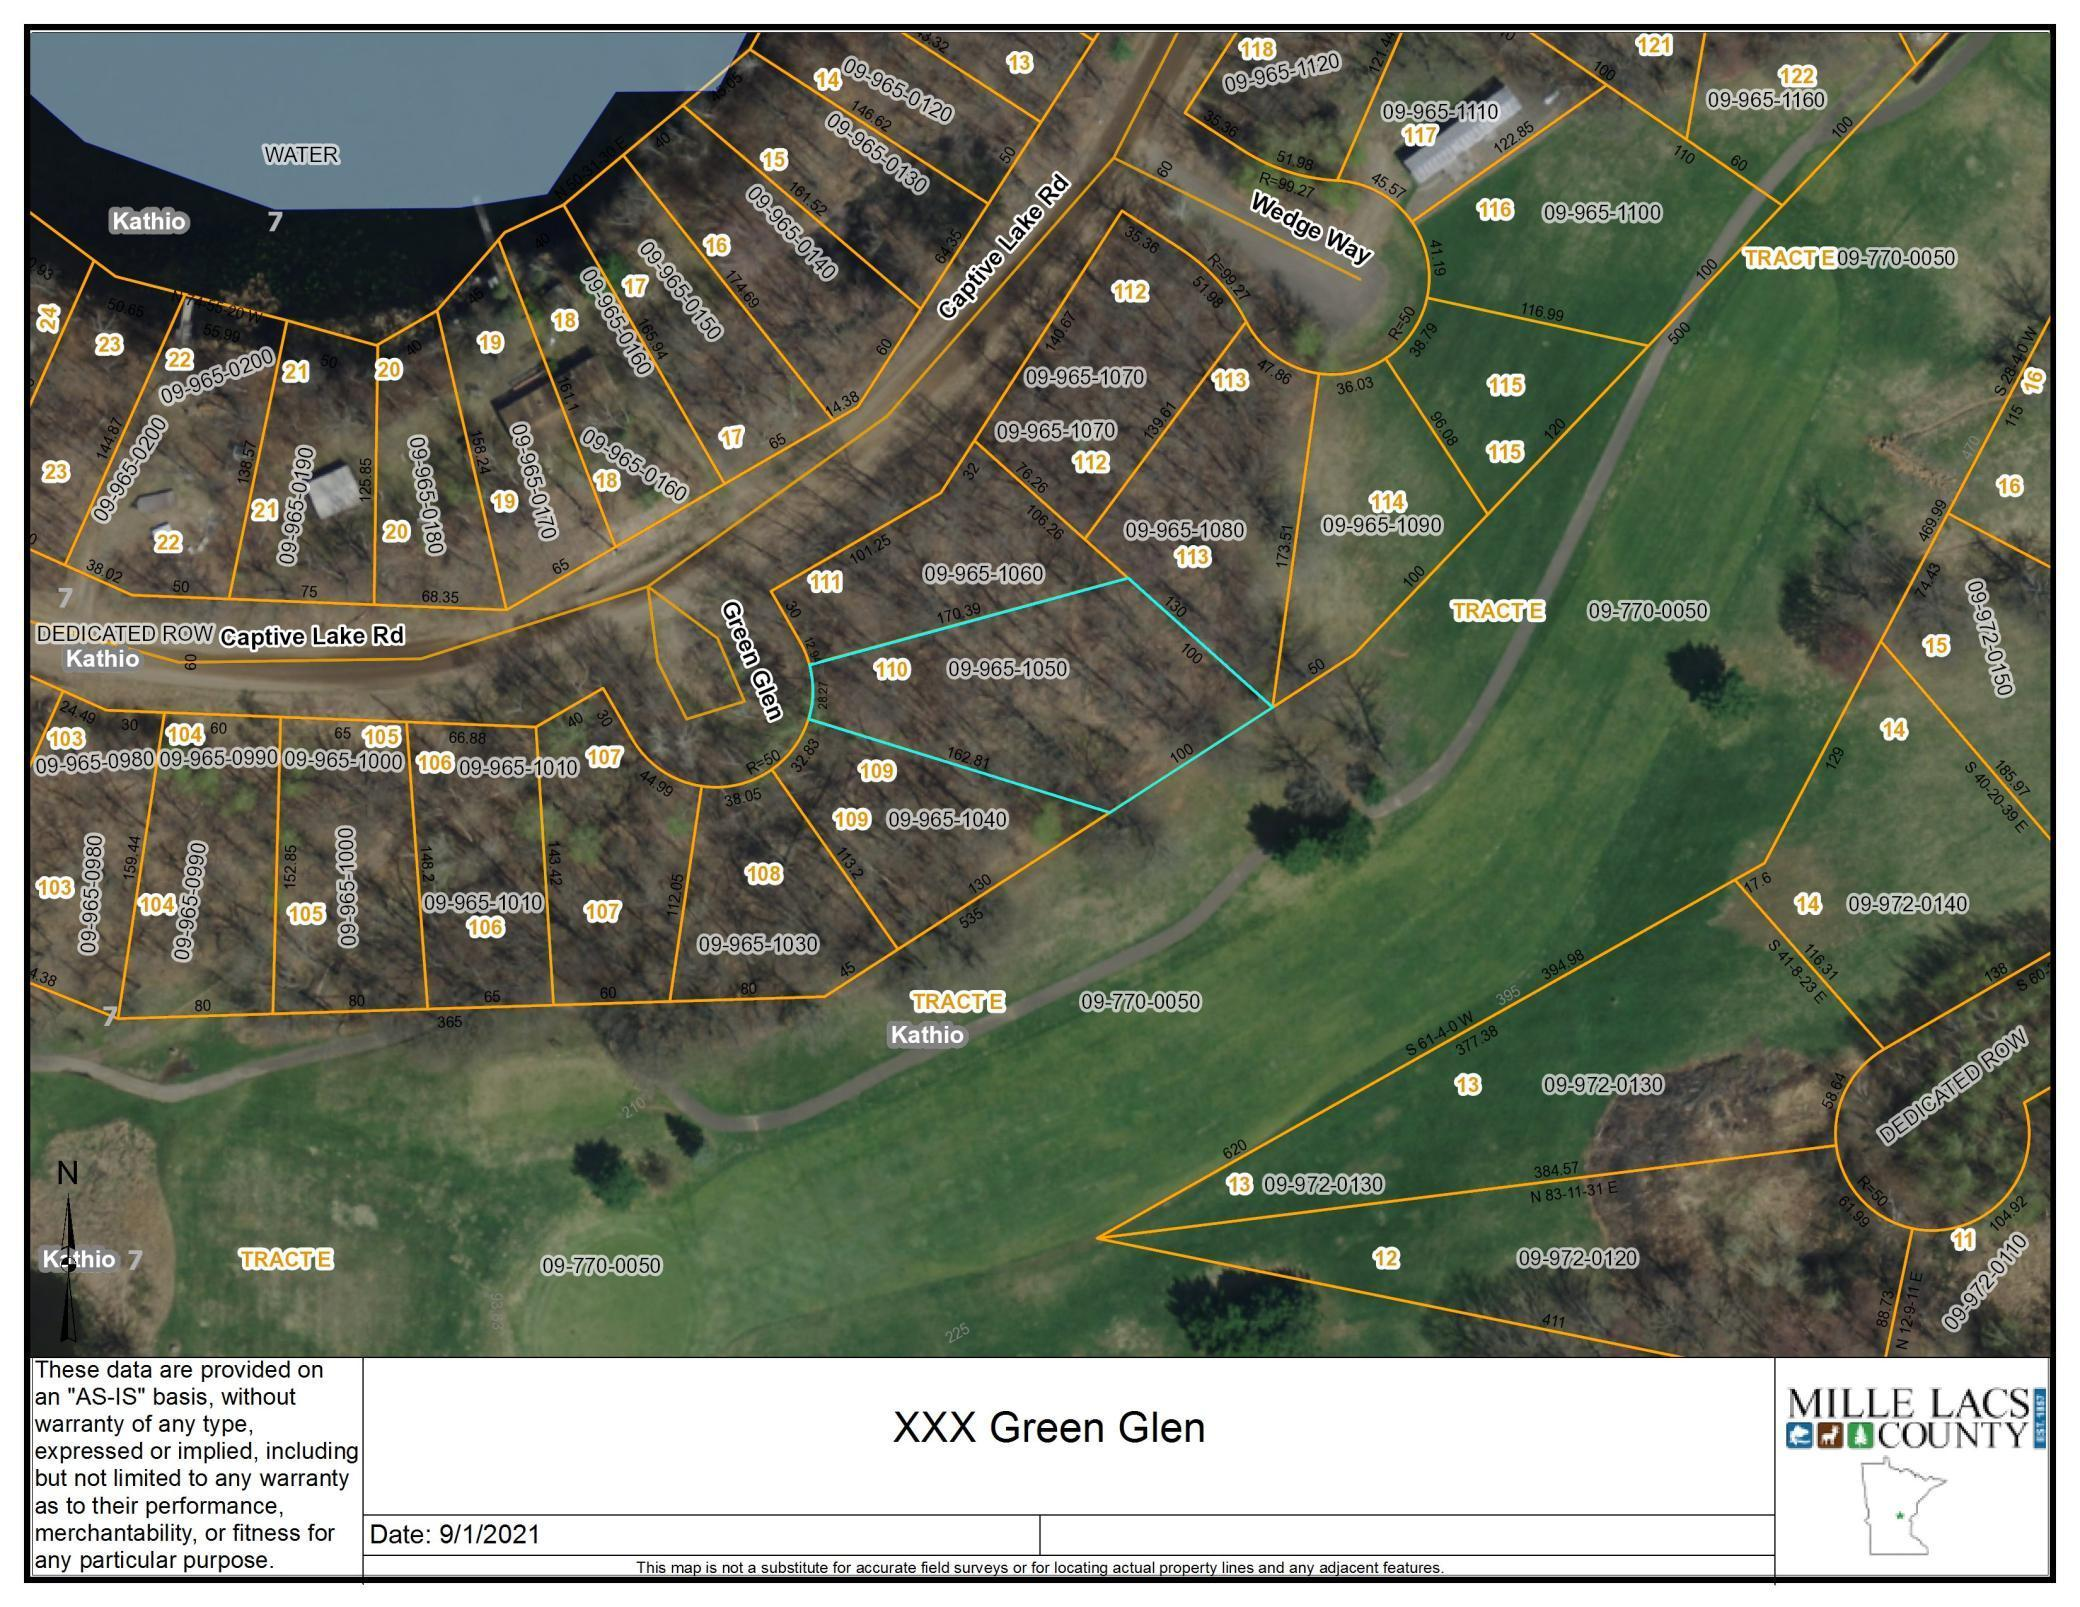 XXX Green Glen